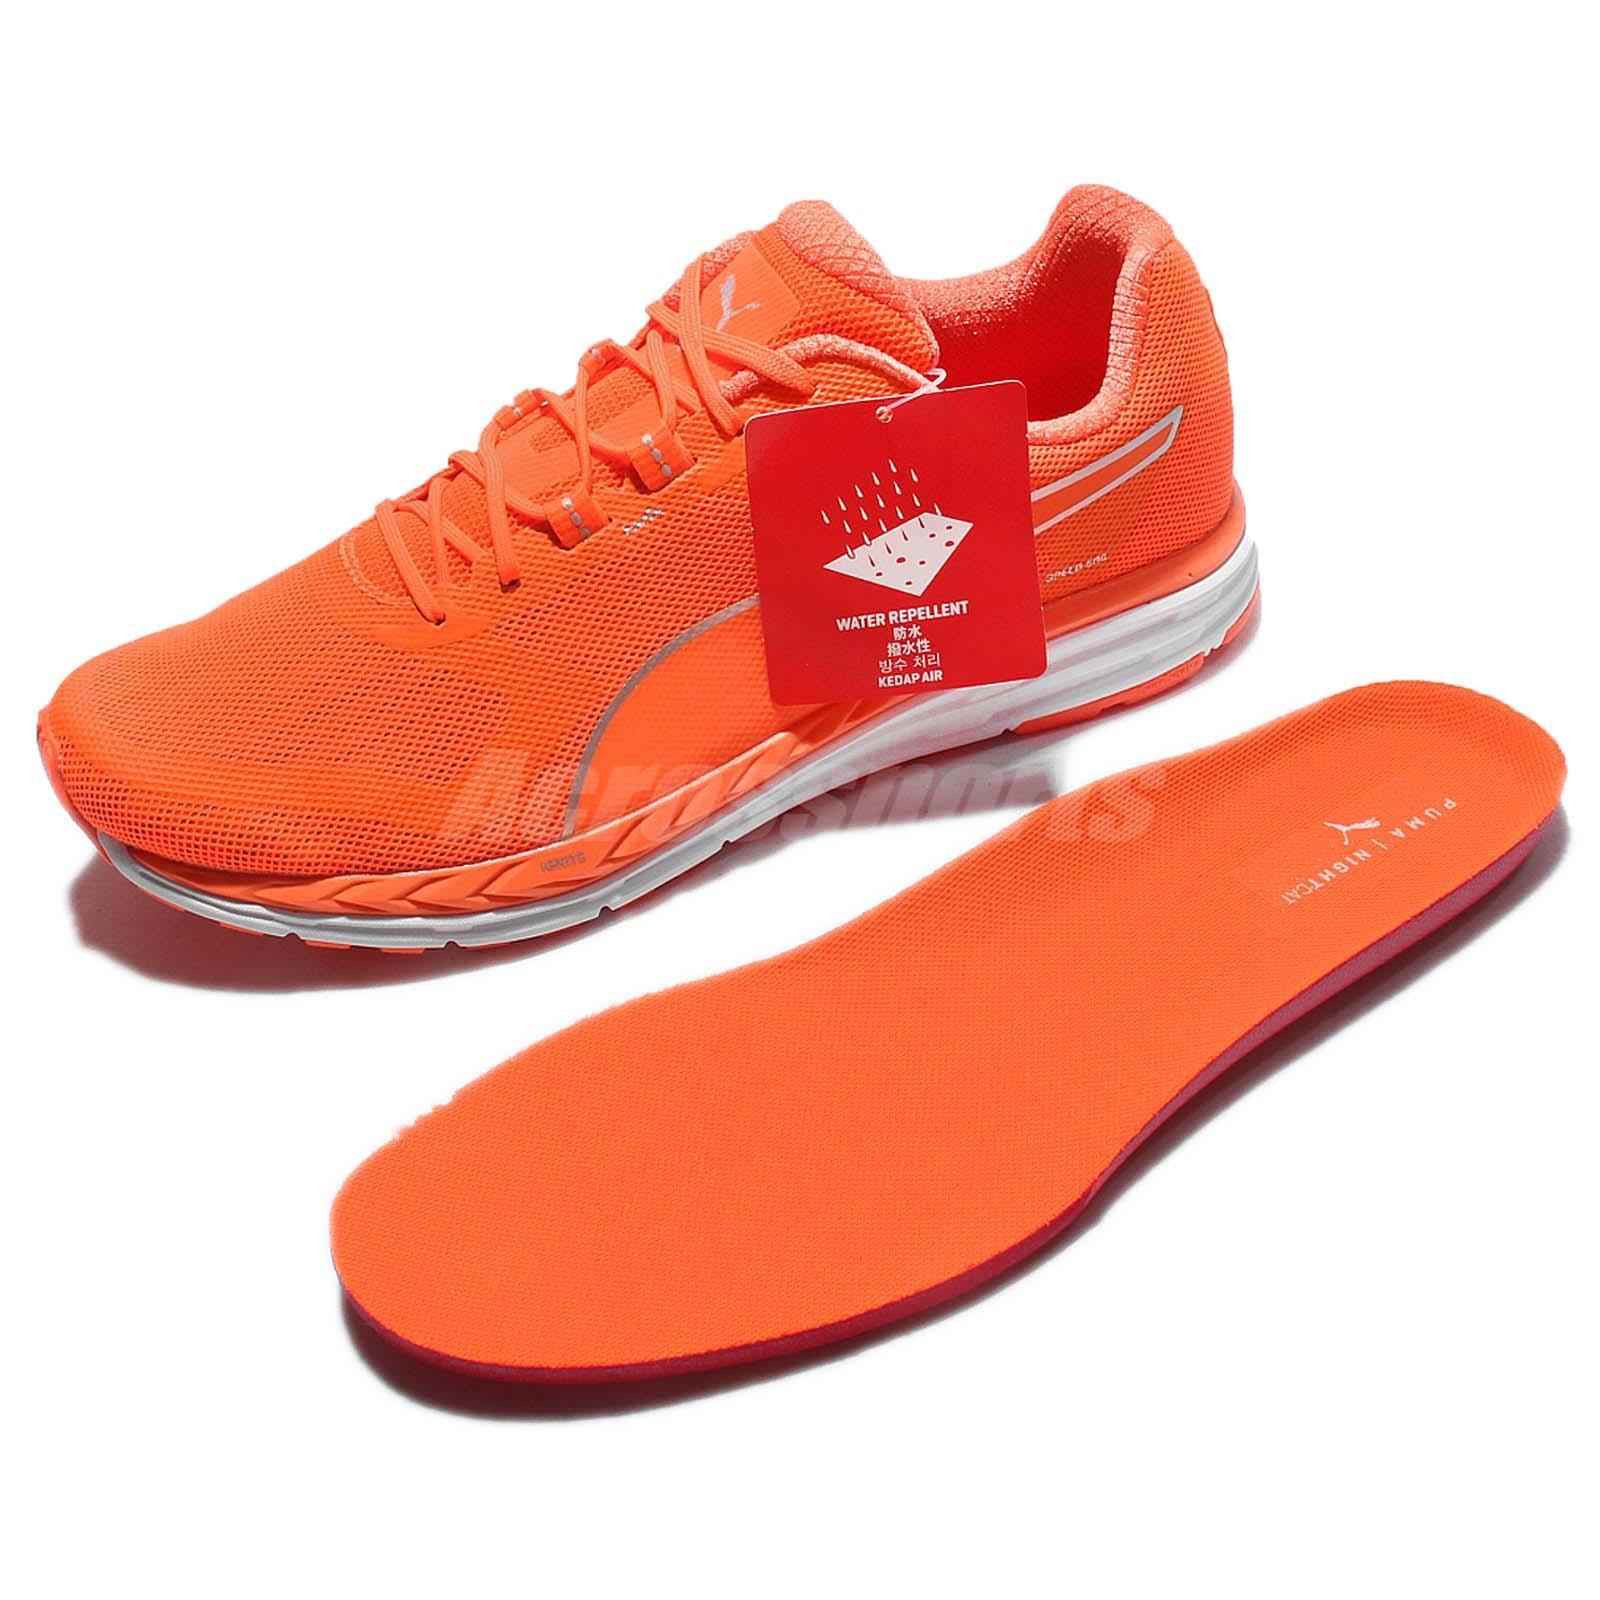 42948bd37b1 Puma Speed 500 Ignite Nightcat 3M Reflective Orange Men Running ...